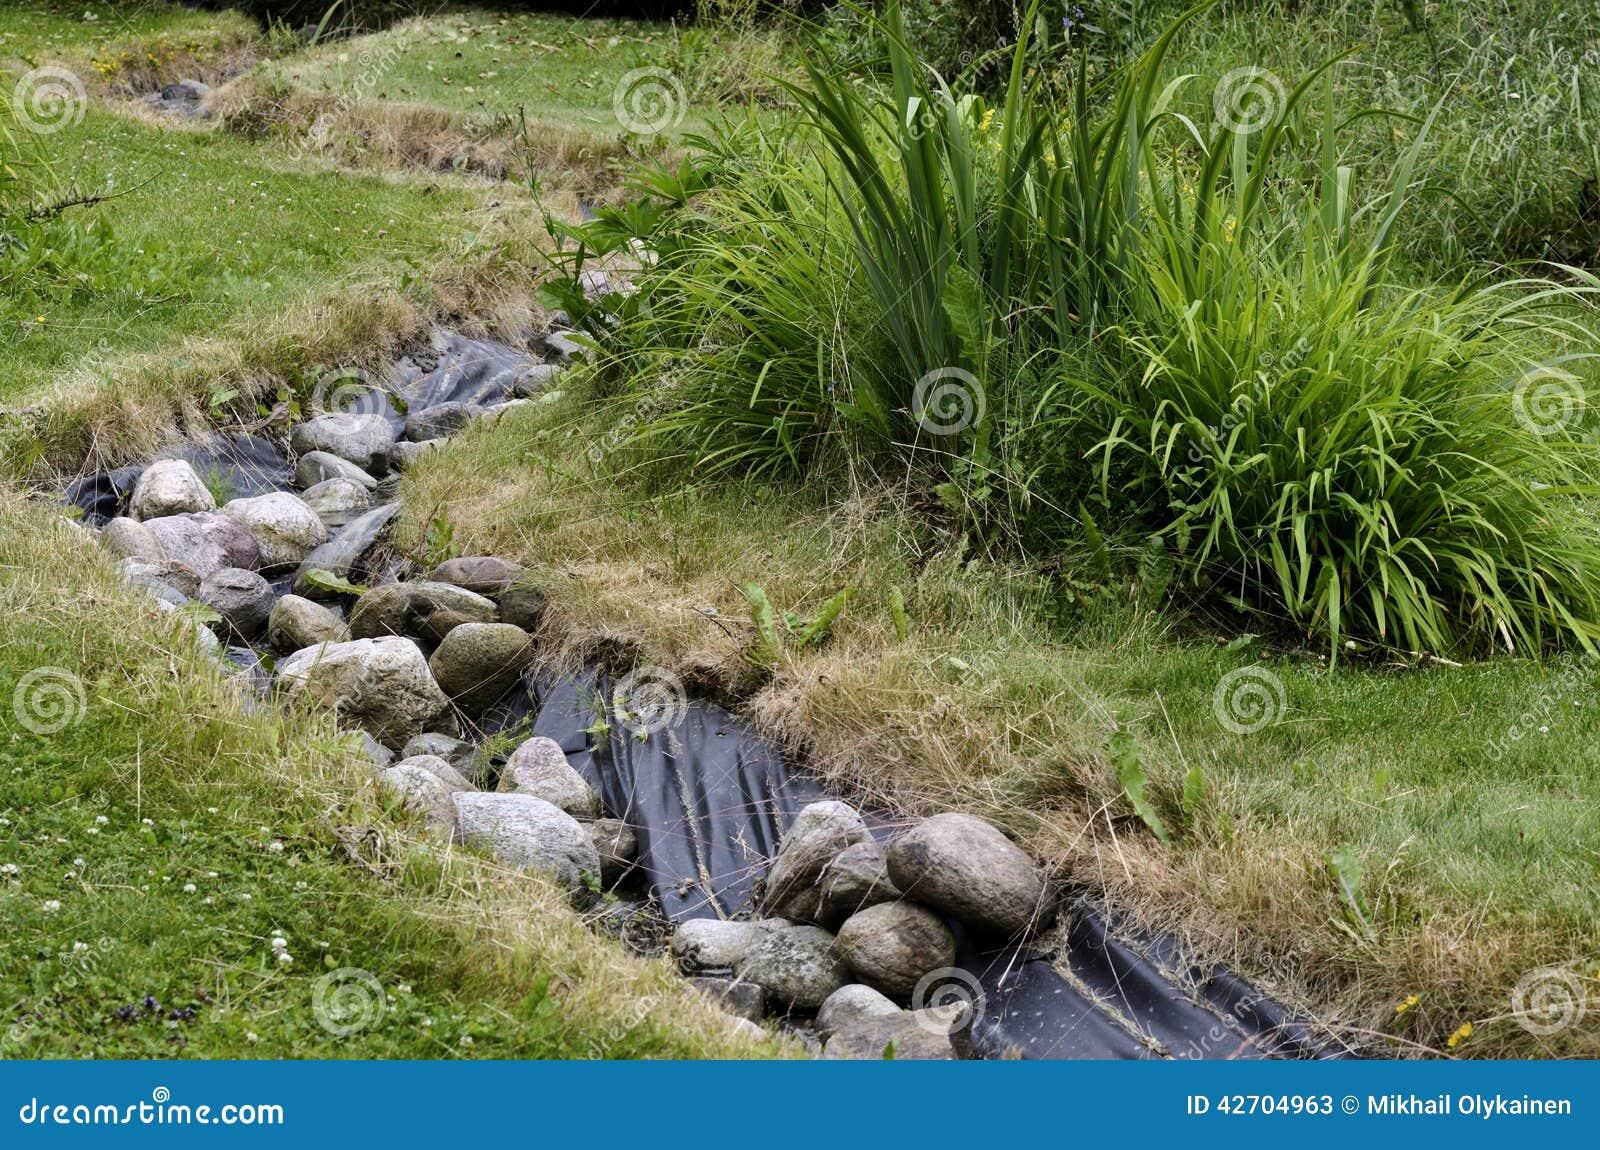 Backyard garden design plans - Stream And Decorative Landscaped Garden Stock Photo Image 42704963